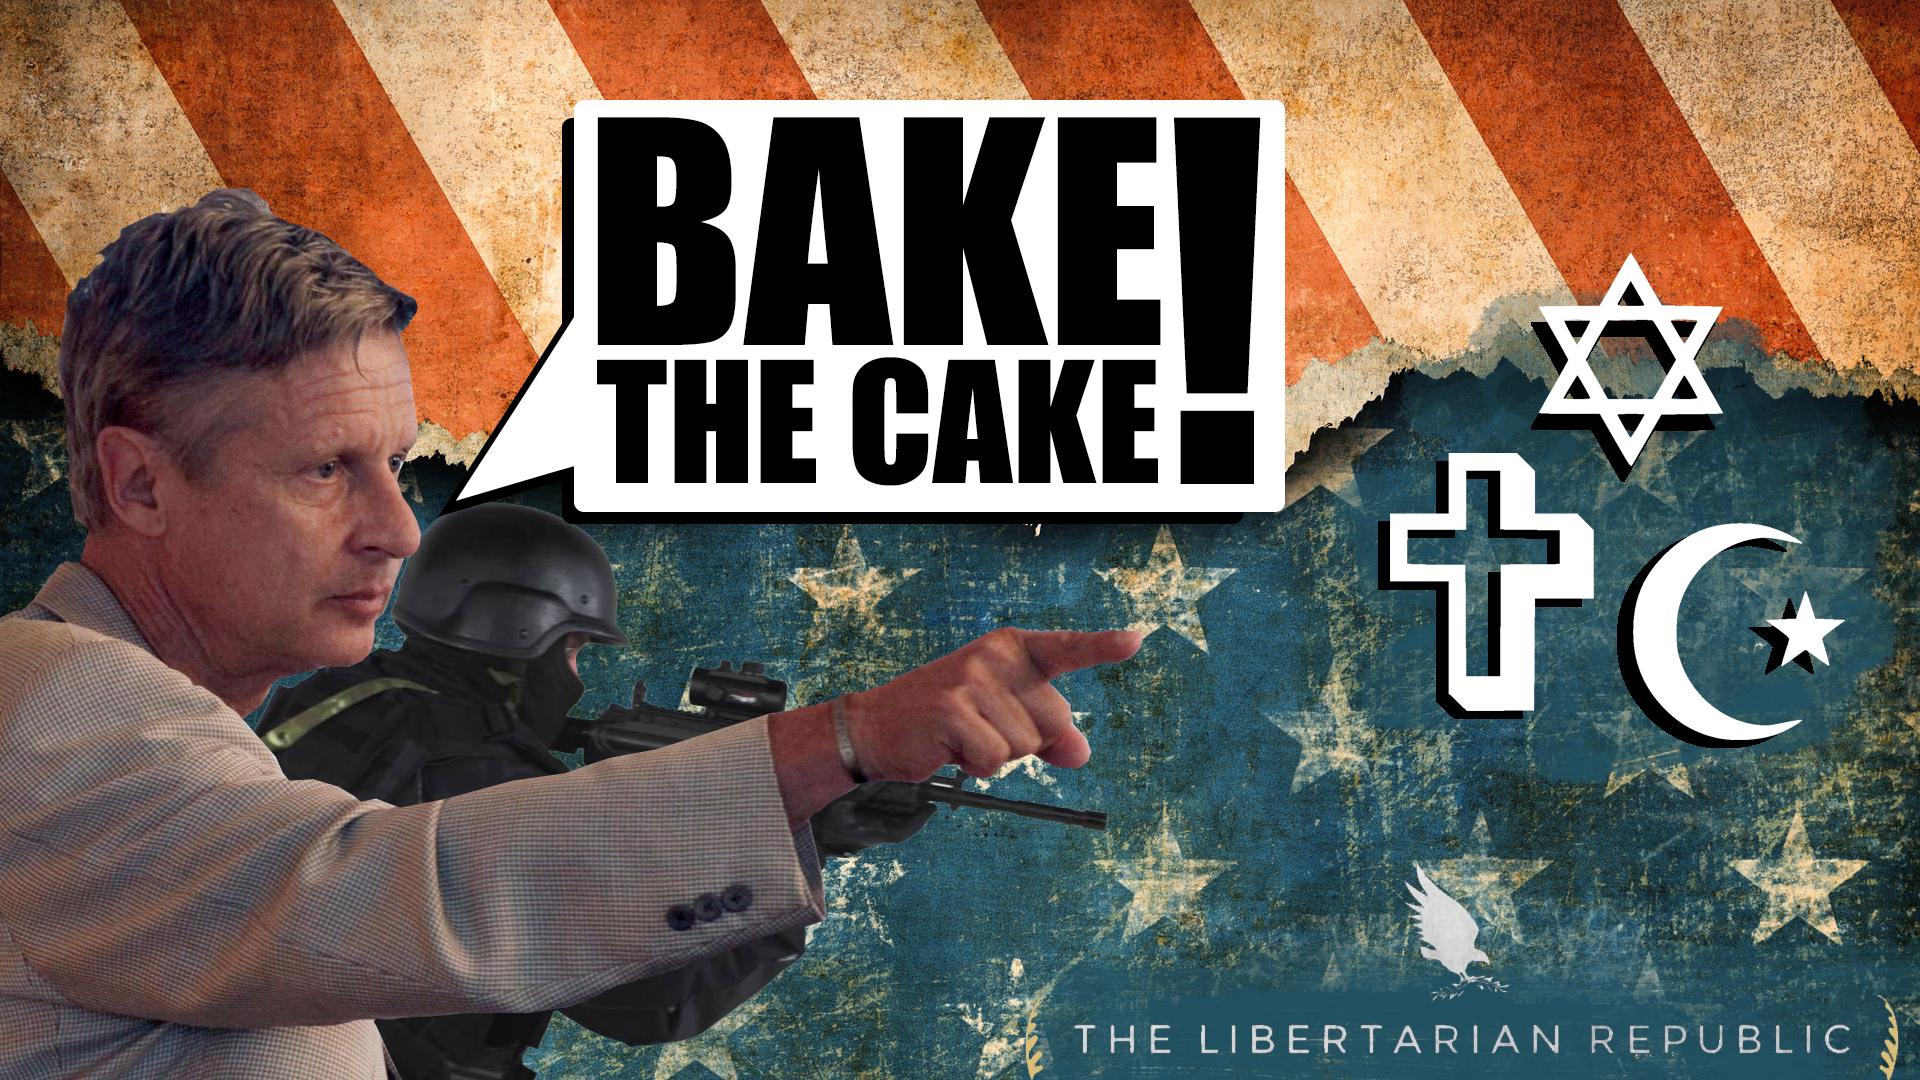 Gary Johnson bake the cake